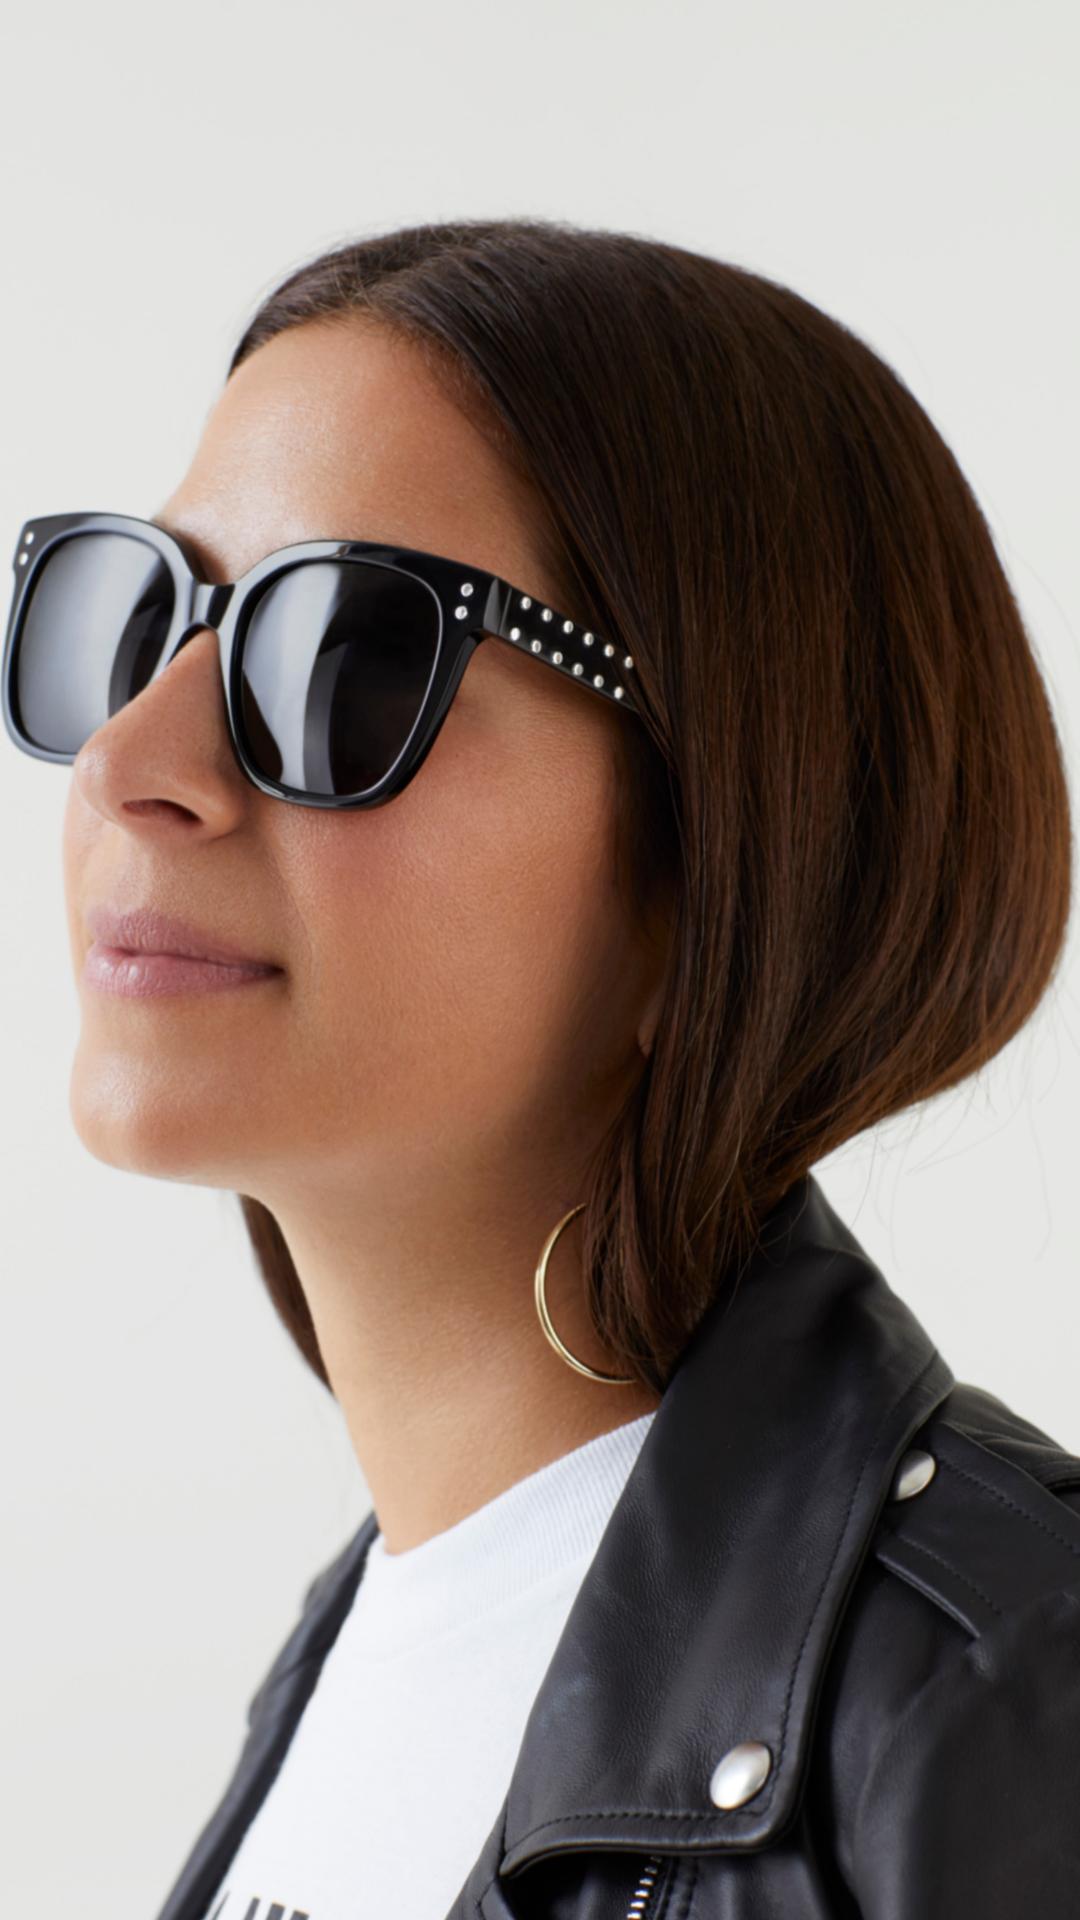 b8187dbfc7e Rebecca Minkoff wears the Cyndi Acetate Square Sunglasses from her  sunglasses collection.